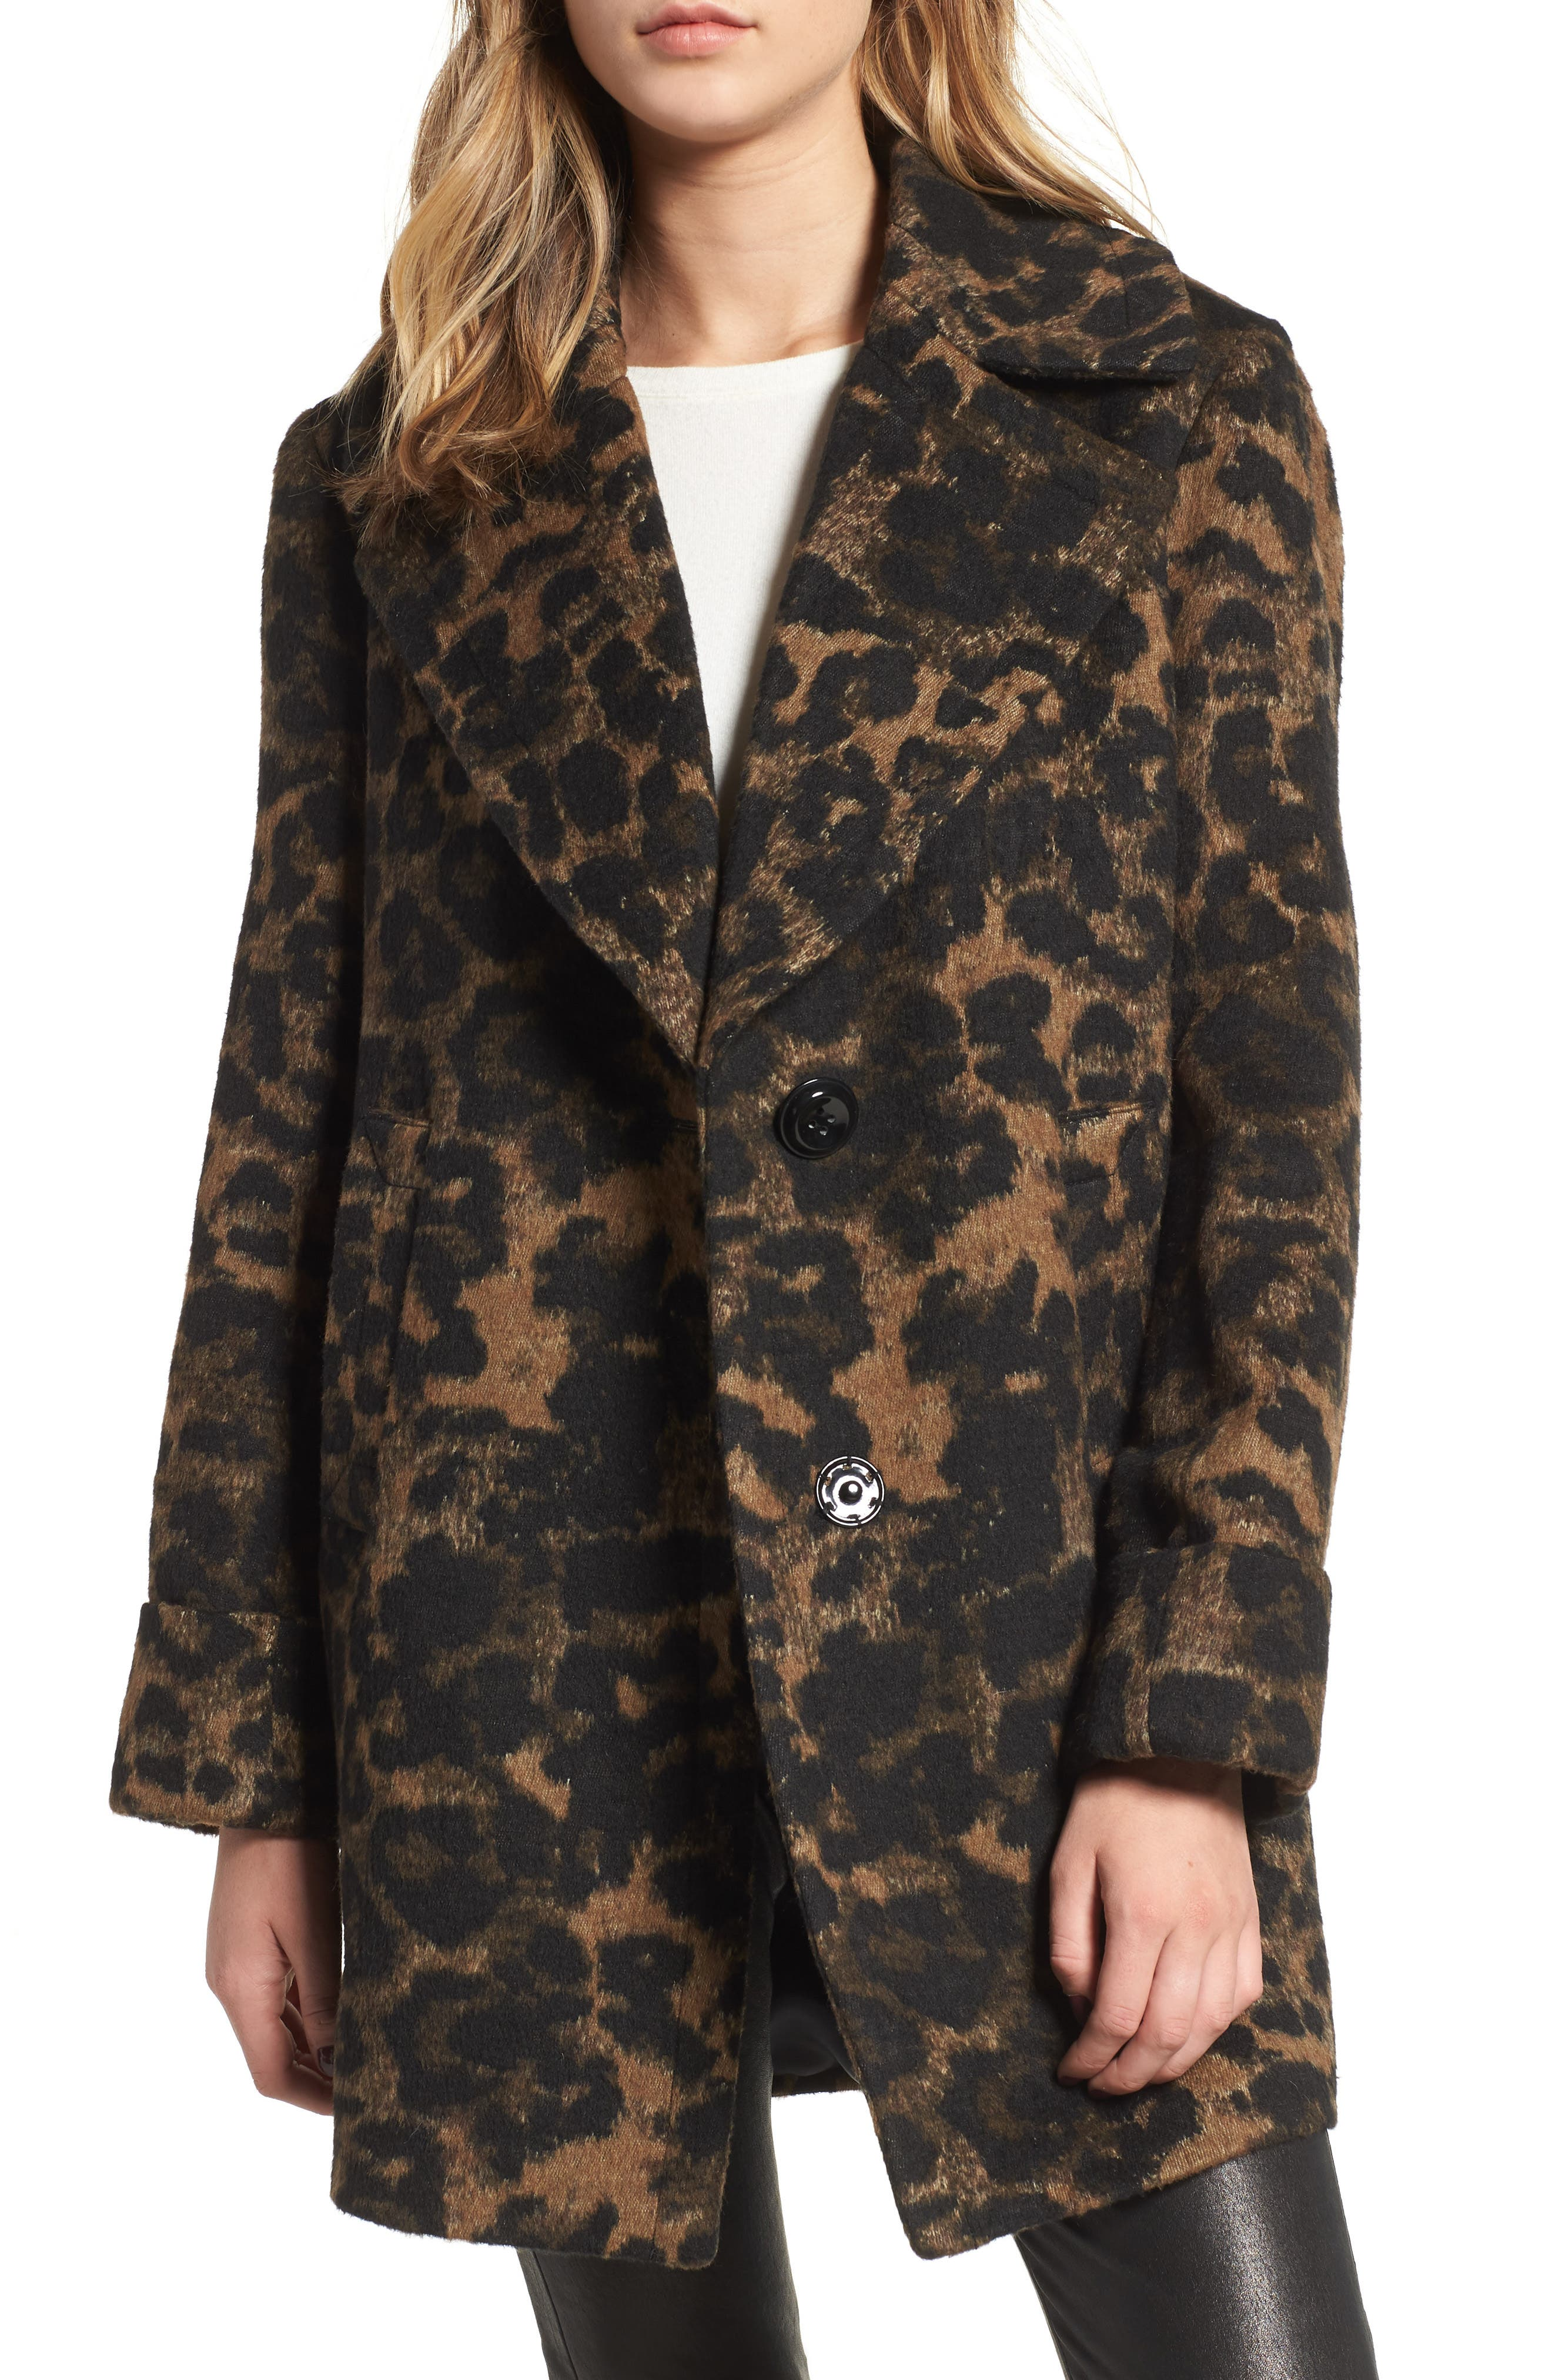 cbe72b65bf8b Women s Animal Print Coats   Jackets